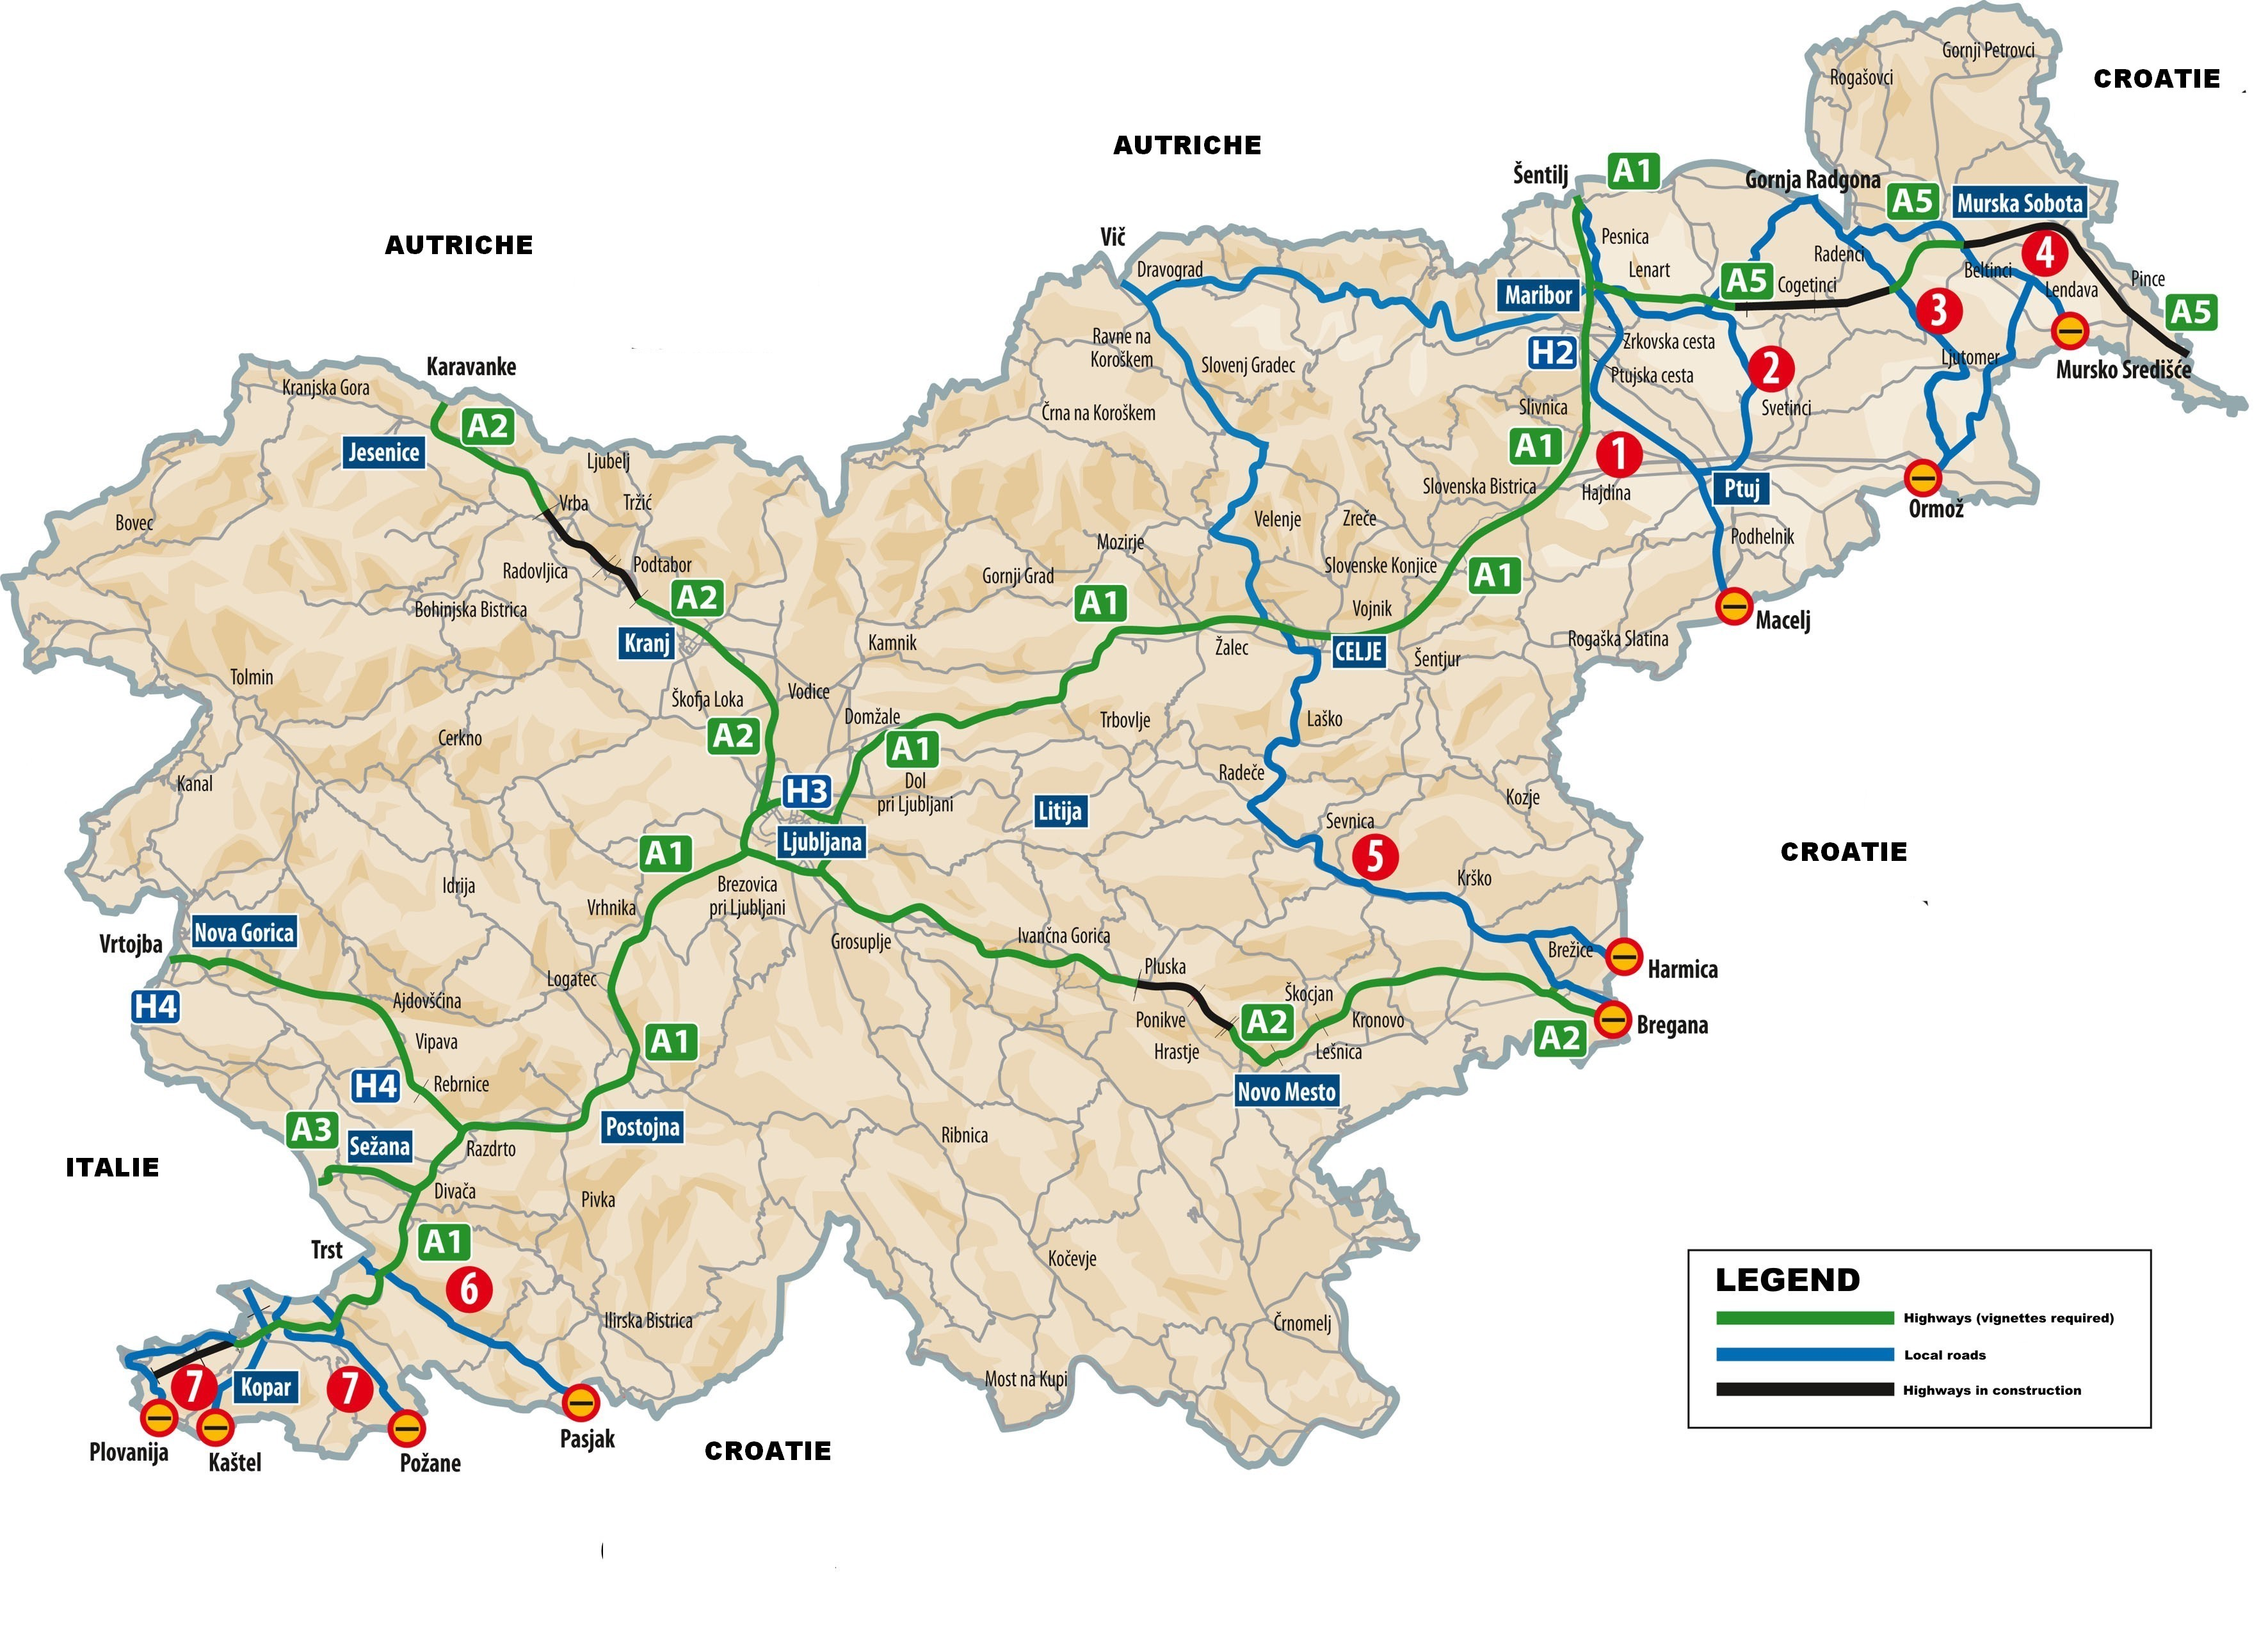 Carte Routiere Suisse Italie.Vignette Autoroute En Slovenie Vinjeta Slovenija